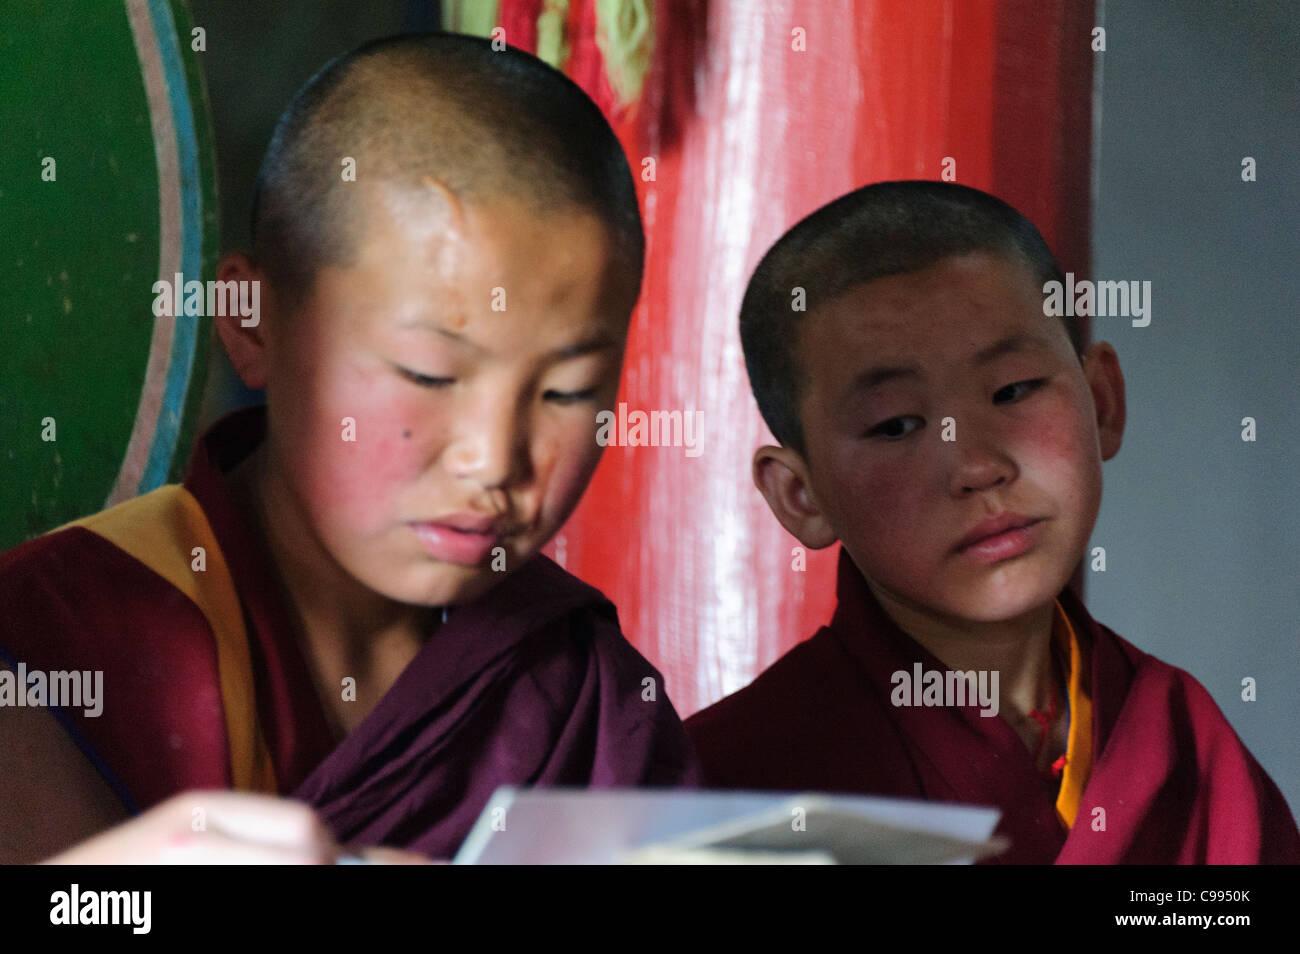 Monasterio de monjes orando en Shankh (khiid), Mongolia Foto de stock